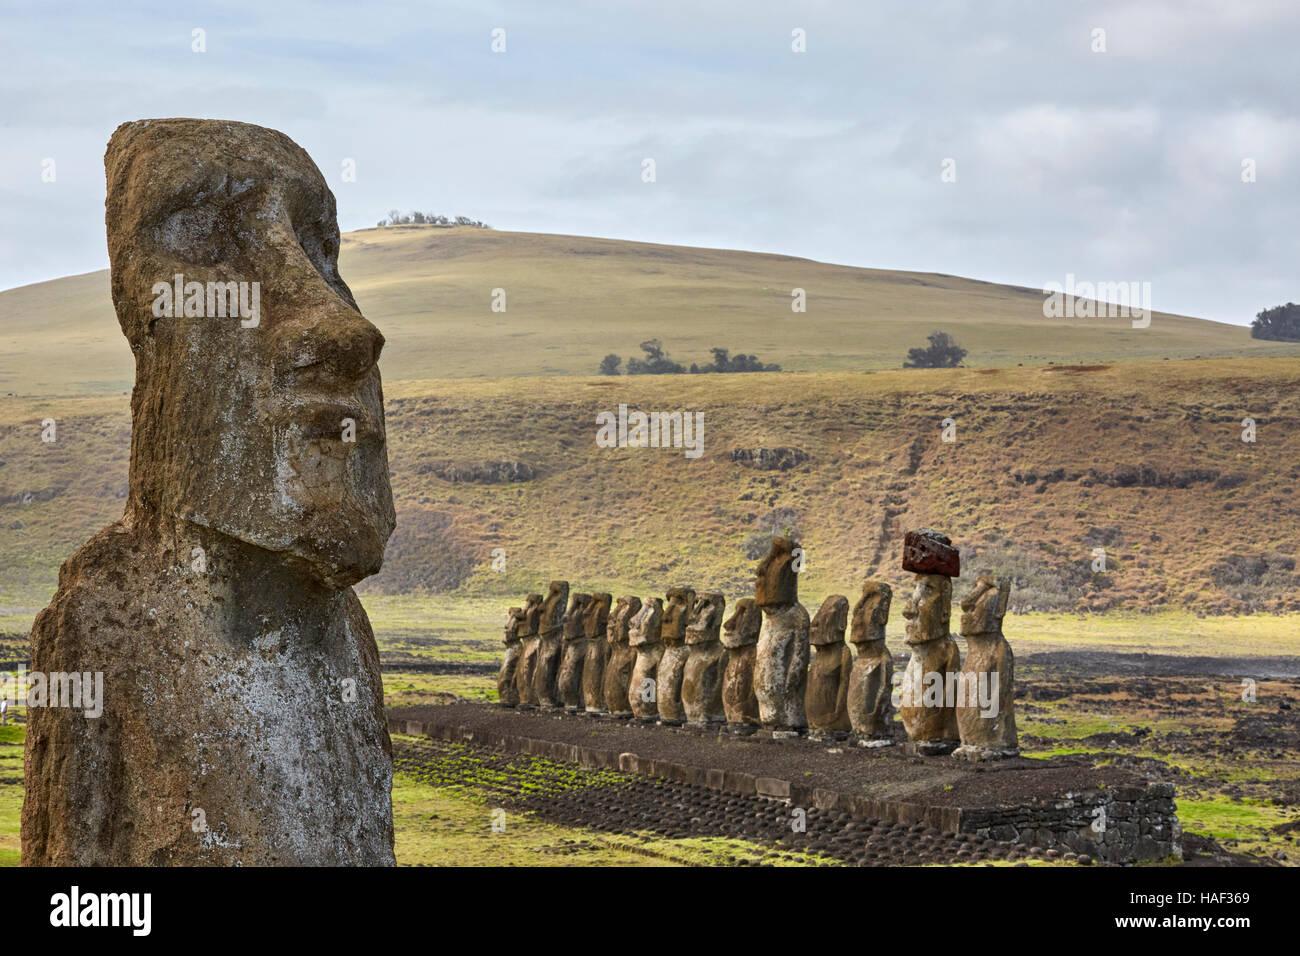 Traveling Moai, Ahu Tongariki, Easter Island - Stock Image